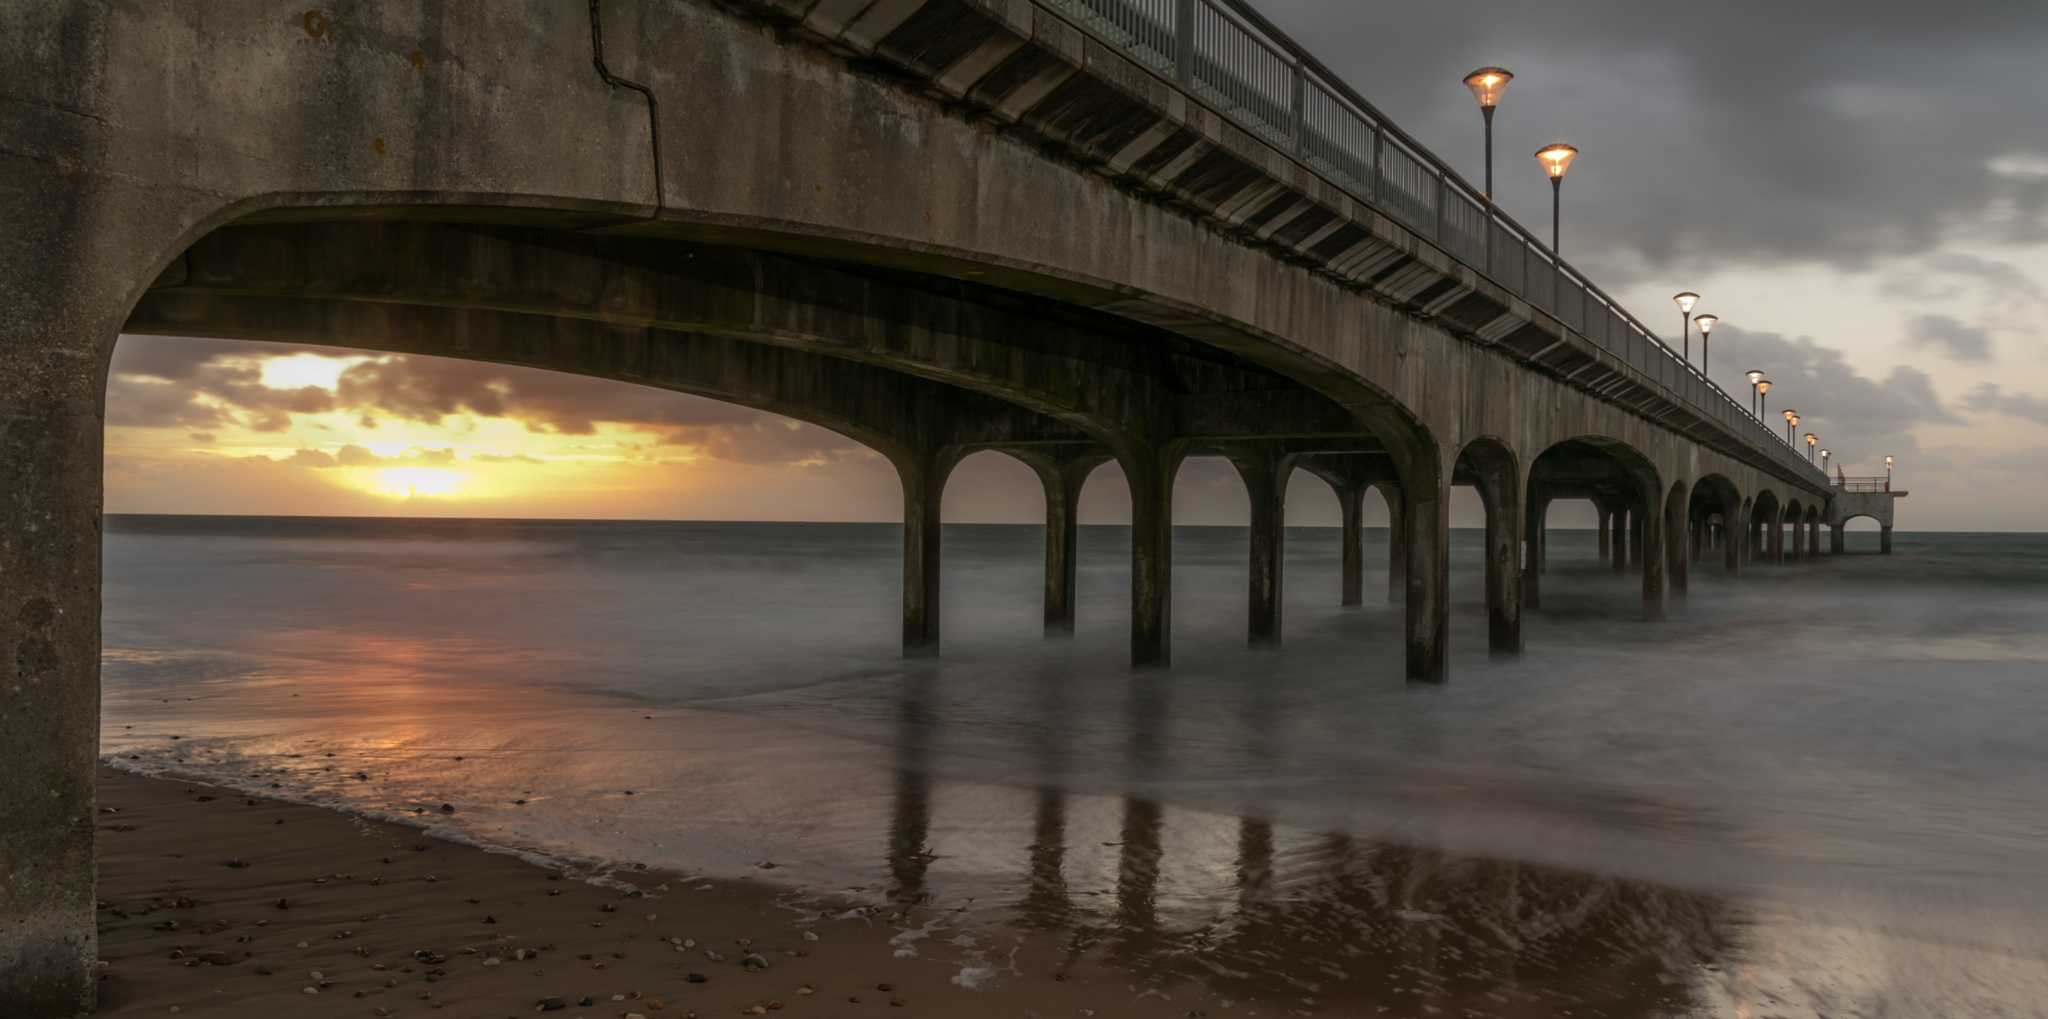 Boscombe pier sunrise  by mark.usher.uk